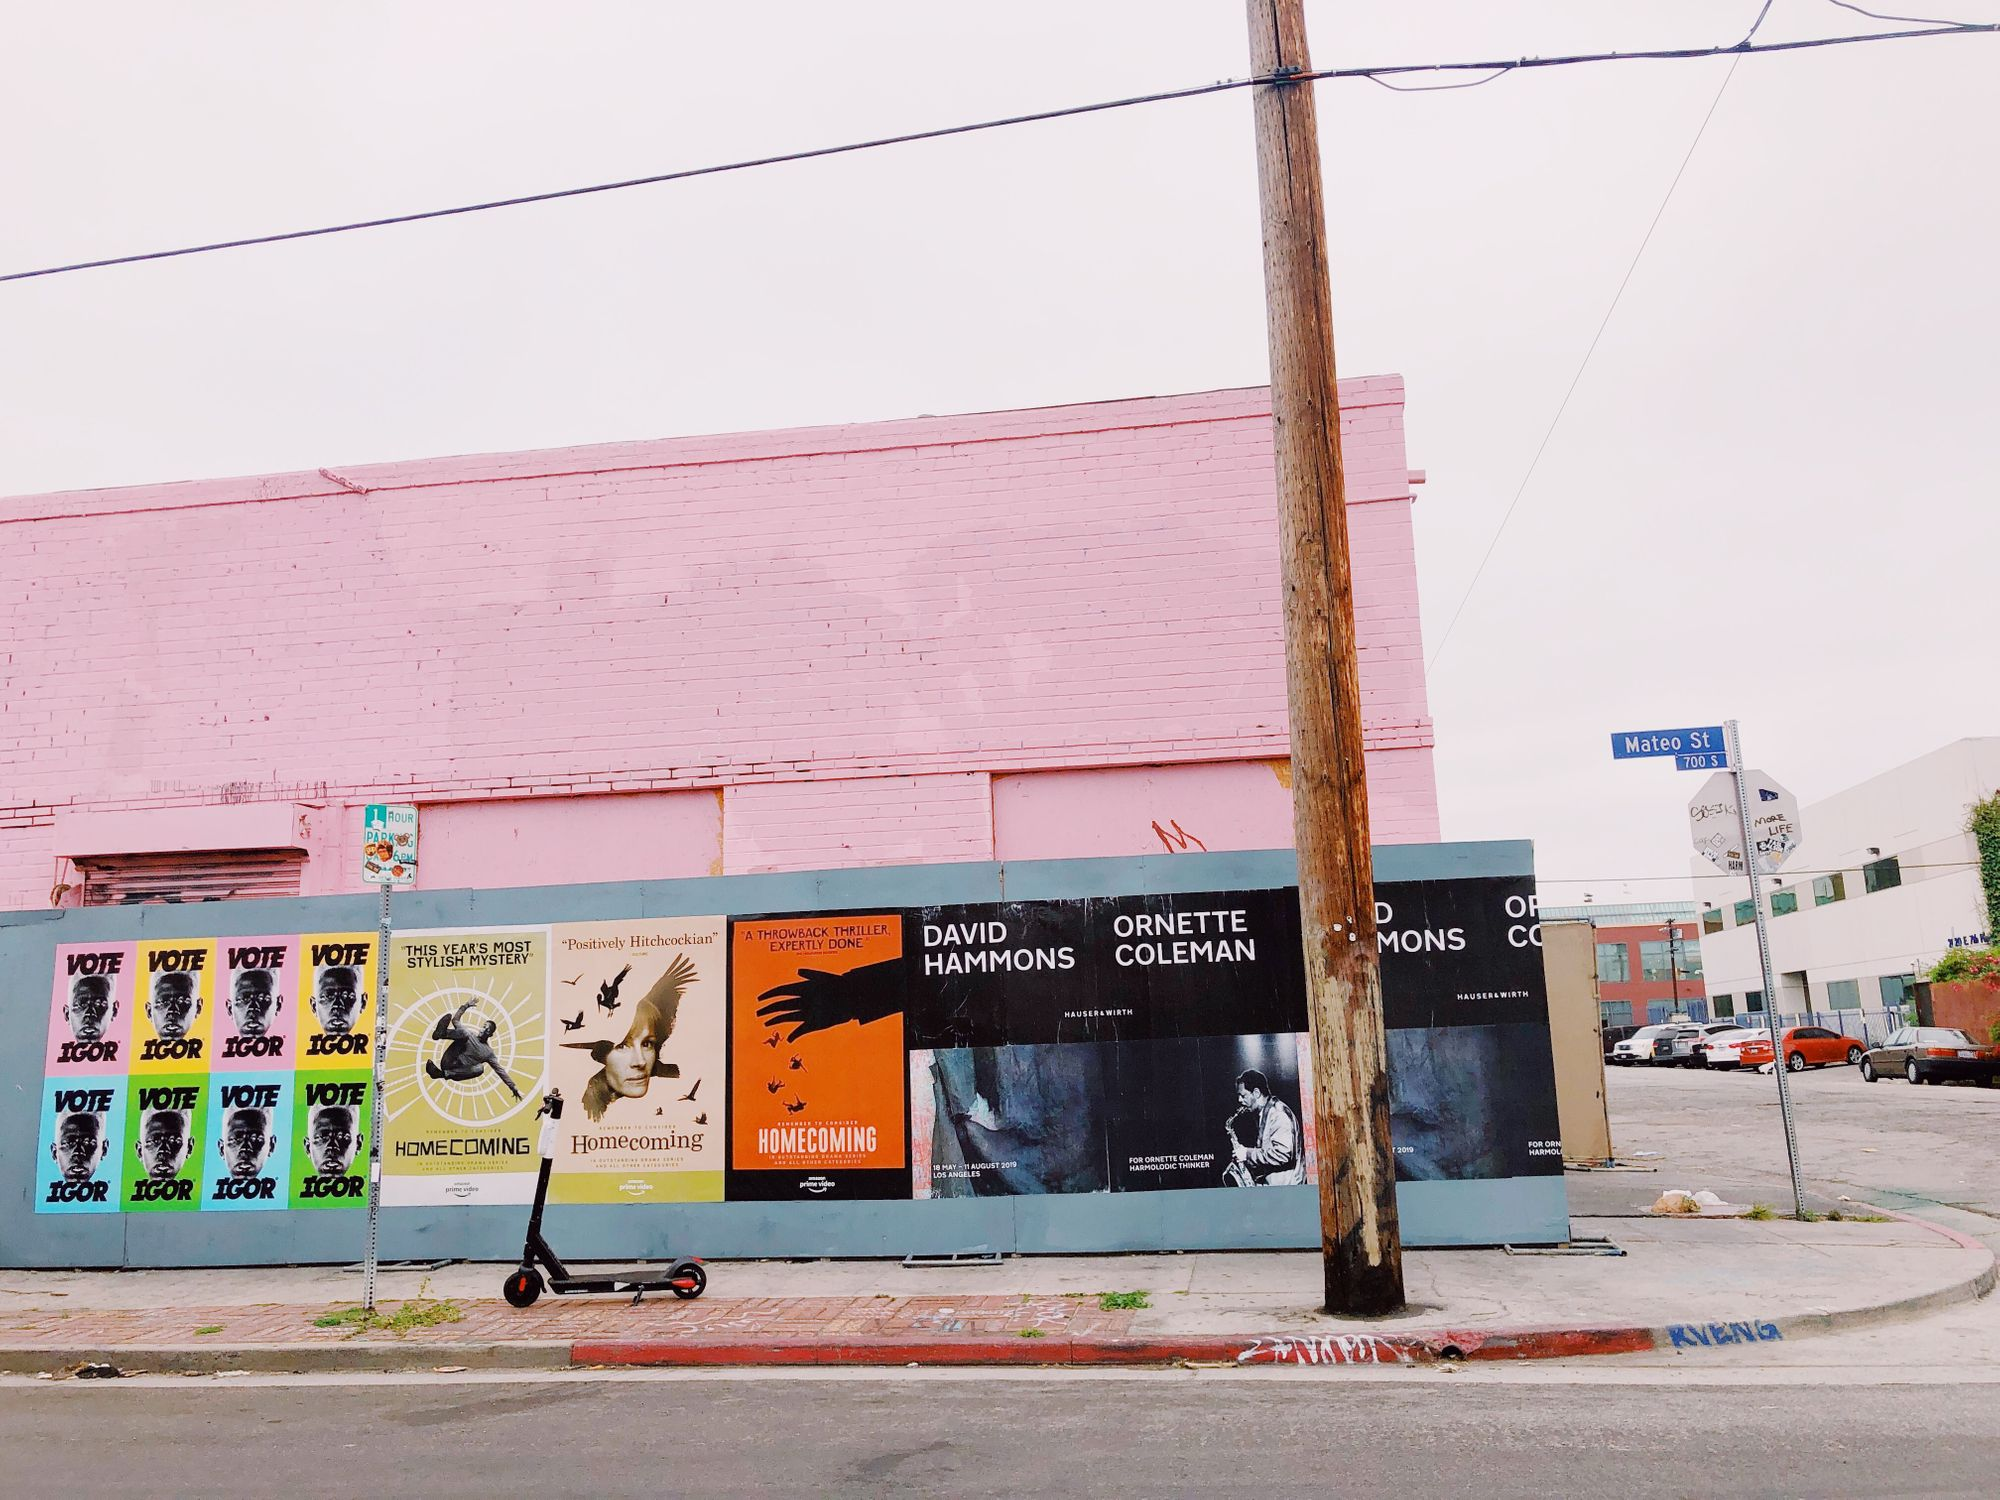 Mateo St, Los Angeles, CA 90021, USA, United States